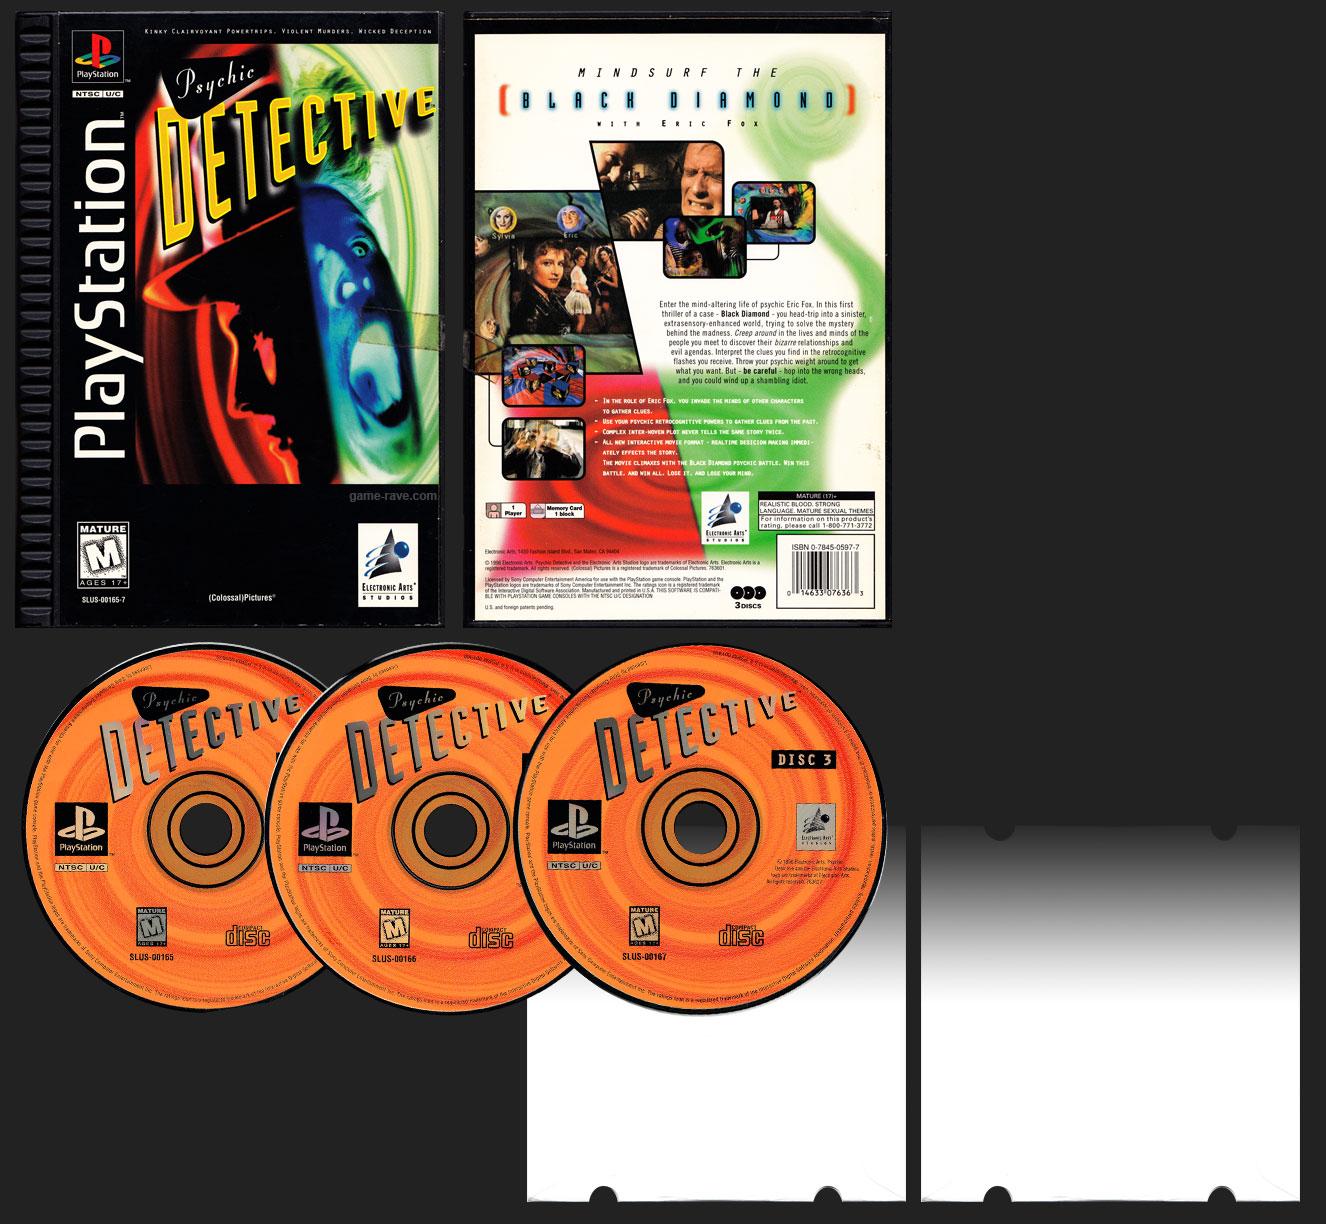 PSX PlayStation Long Box Psychic Detective Black Label Retail Release